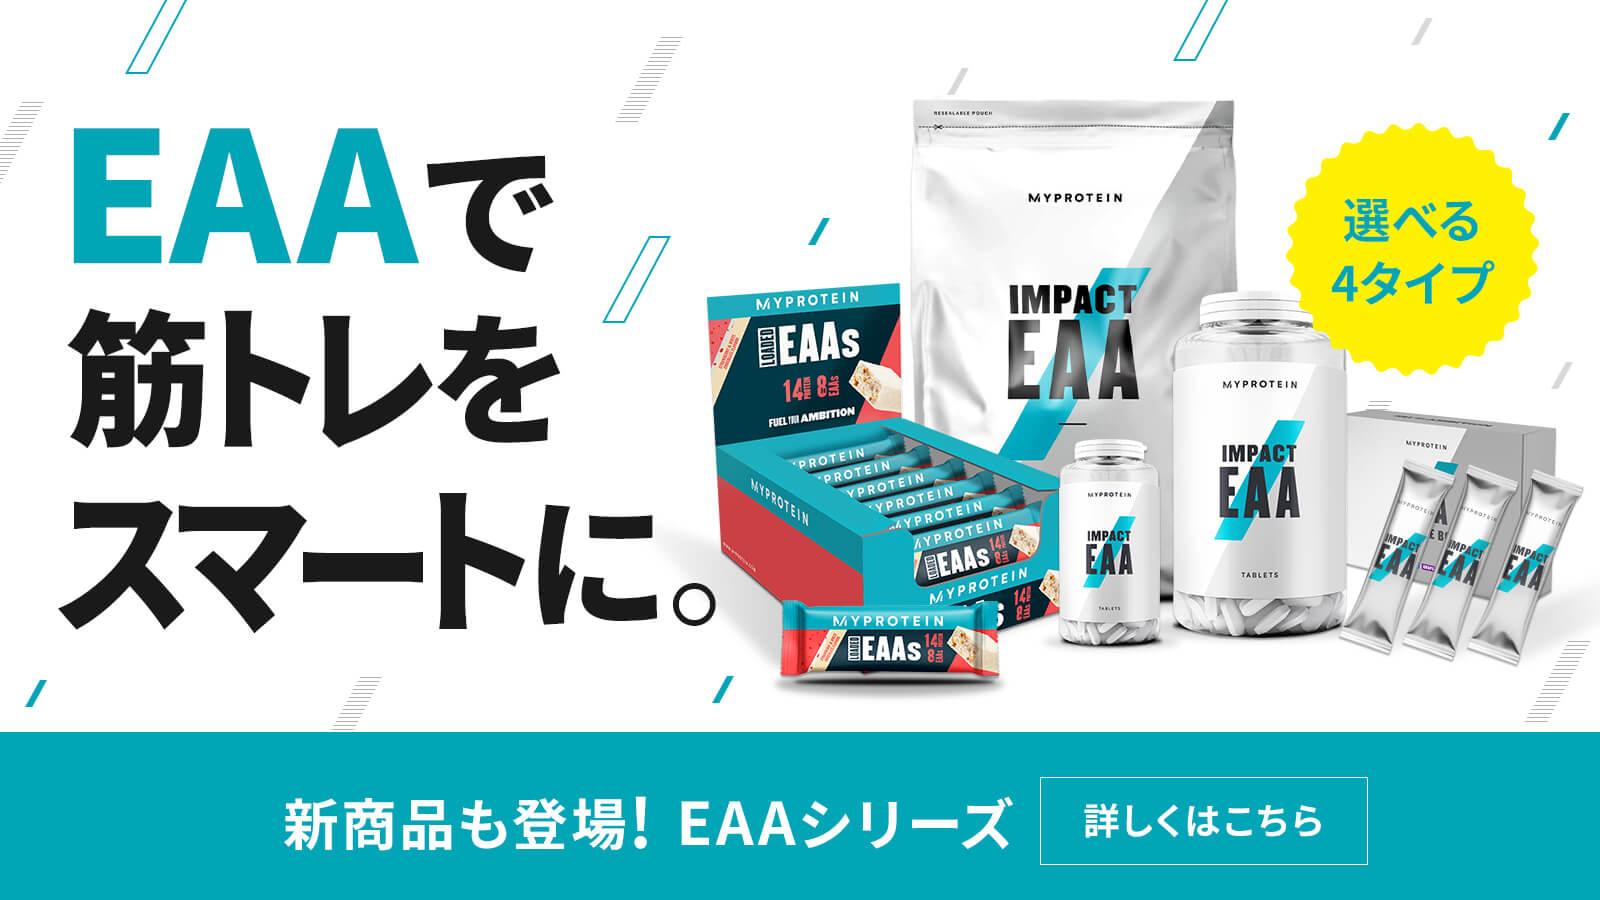 EAA Campaign 2020